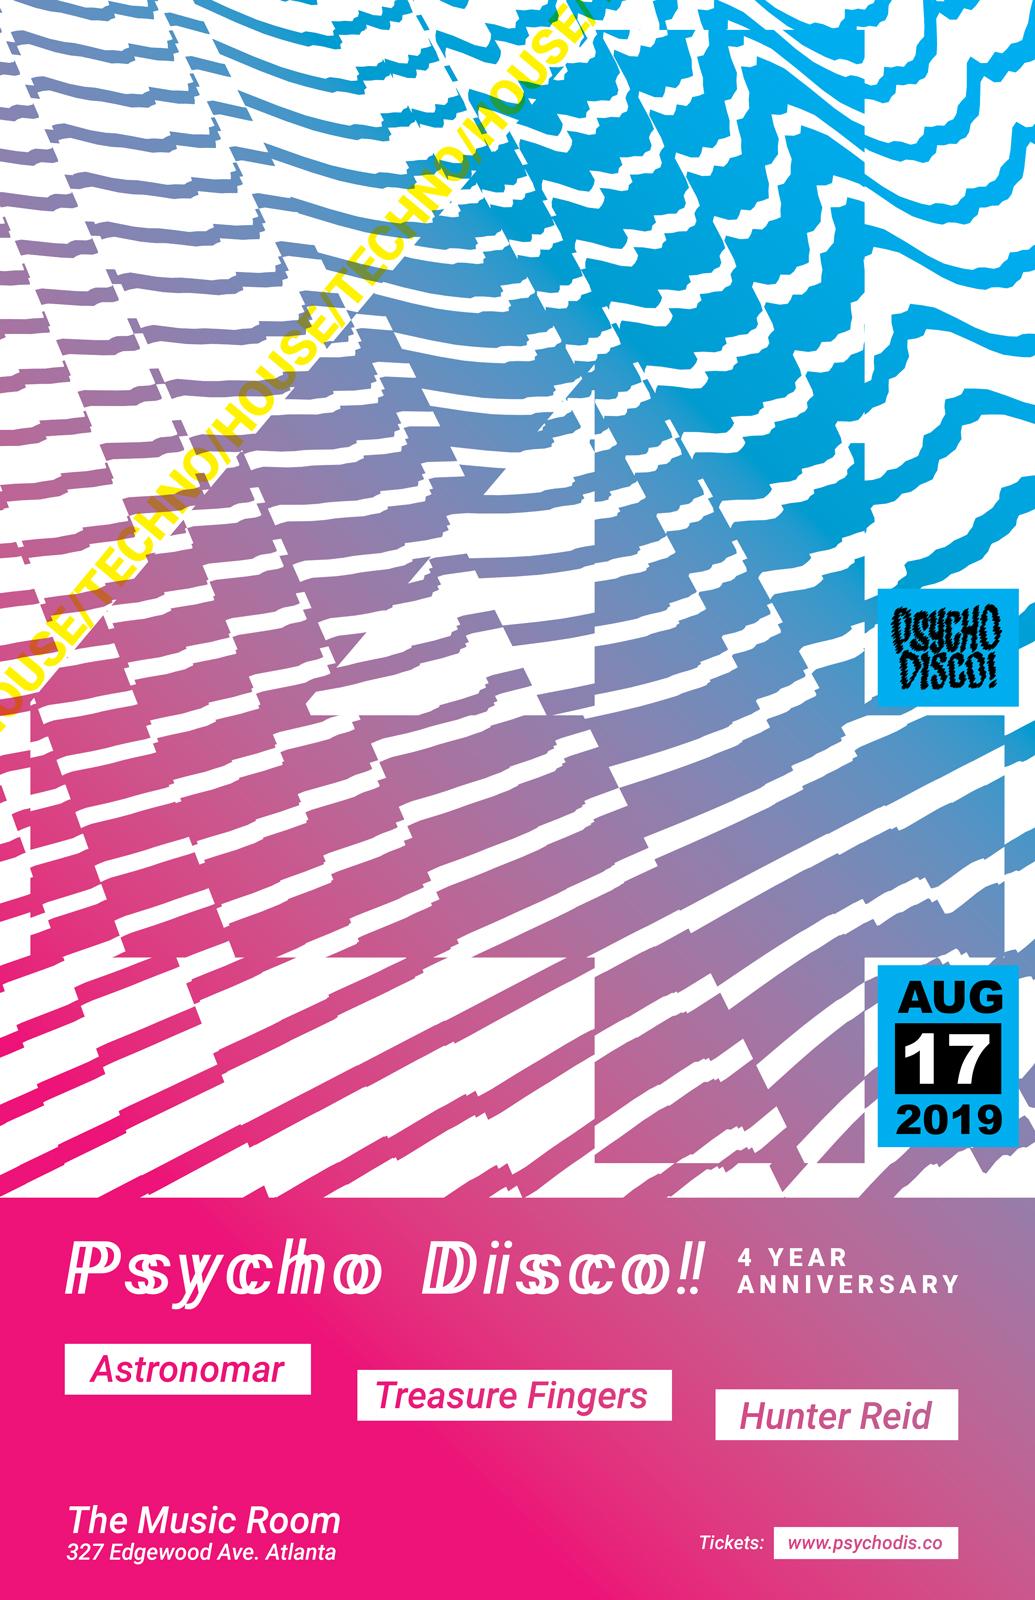 Psycho Disco! Aug 17 Poster